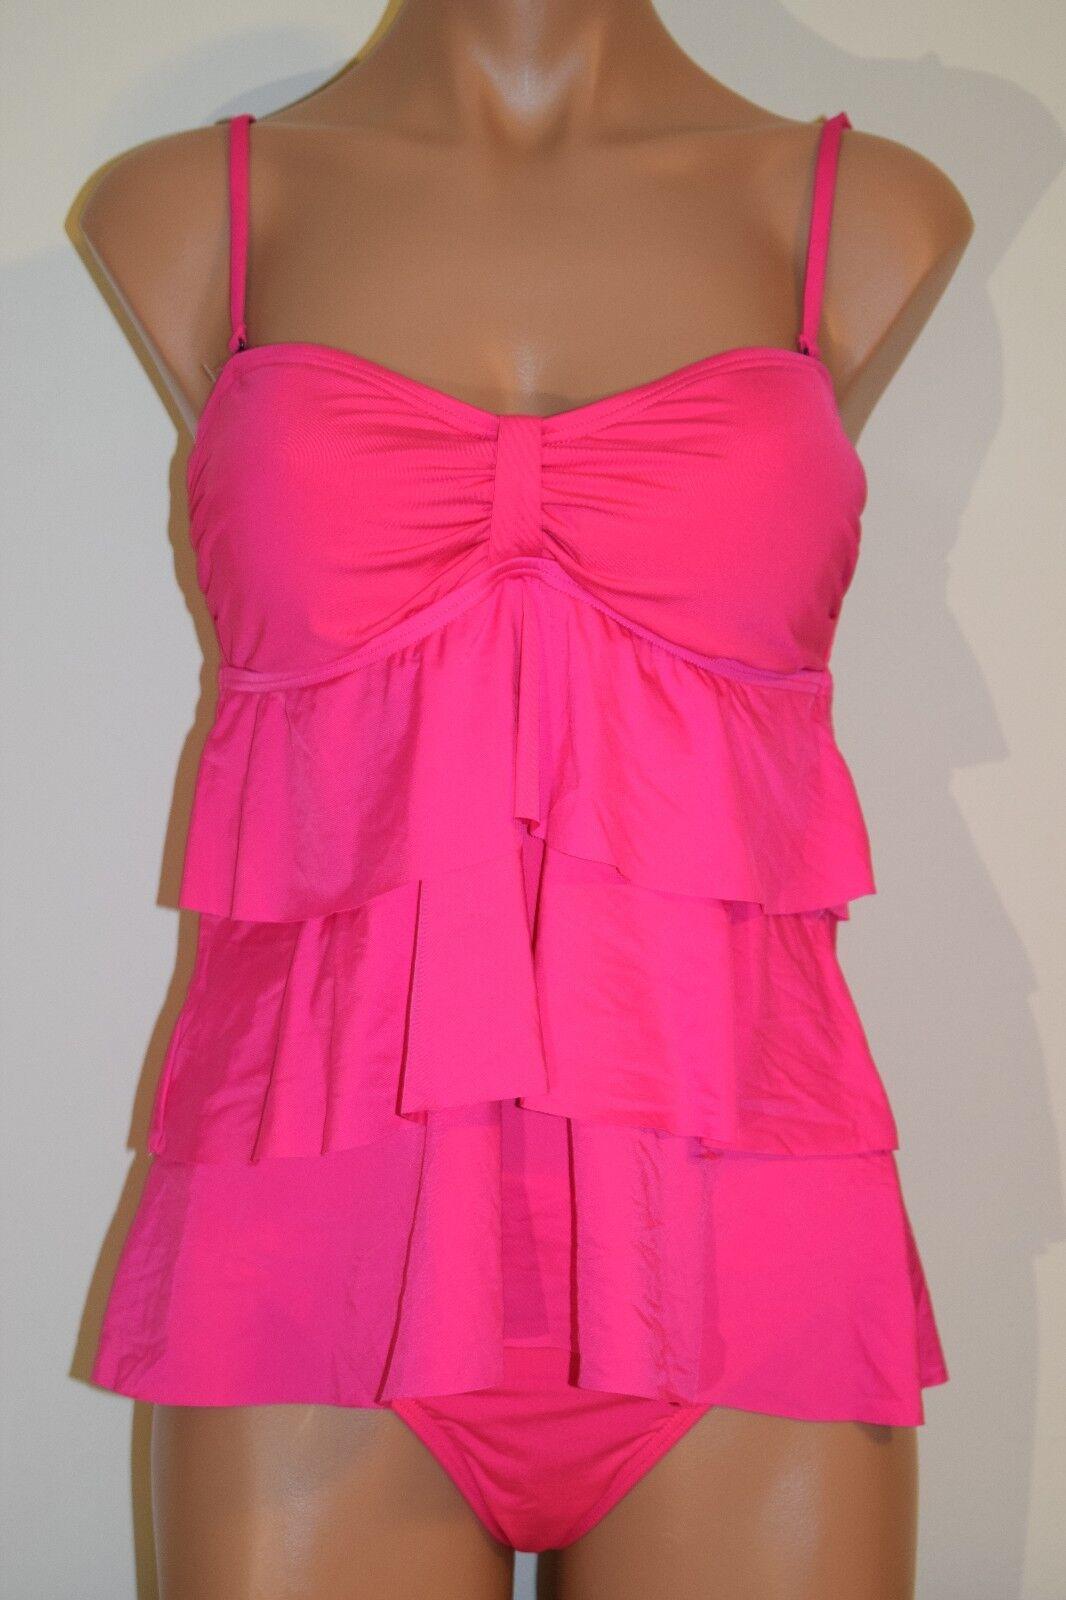 NWT Kenneth Cole Swimsuit Bikini 2pc Set Pink Straps Ruffled Sz L